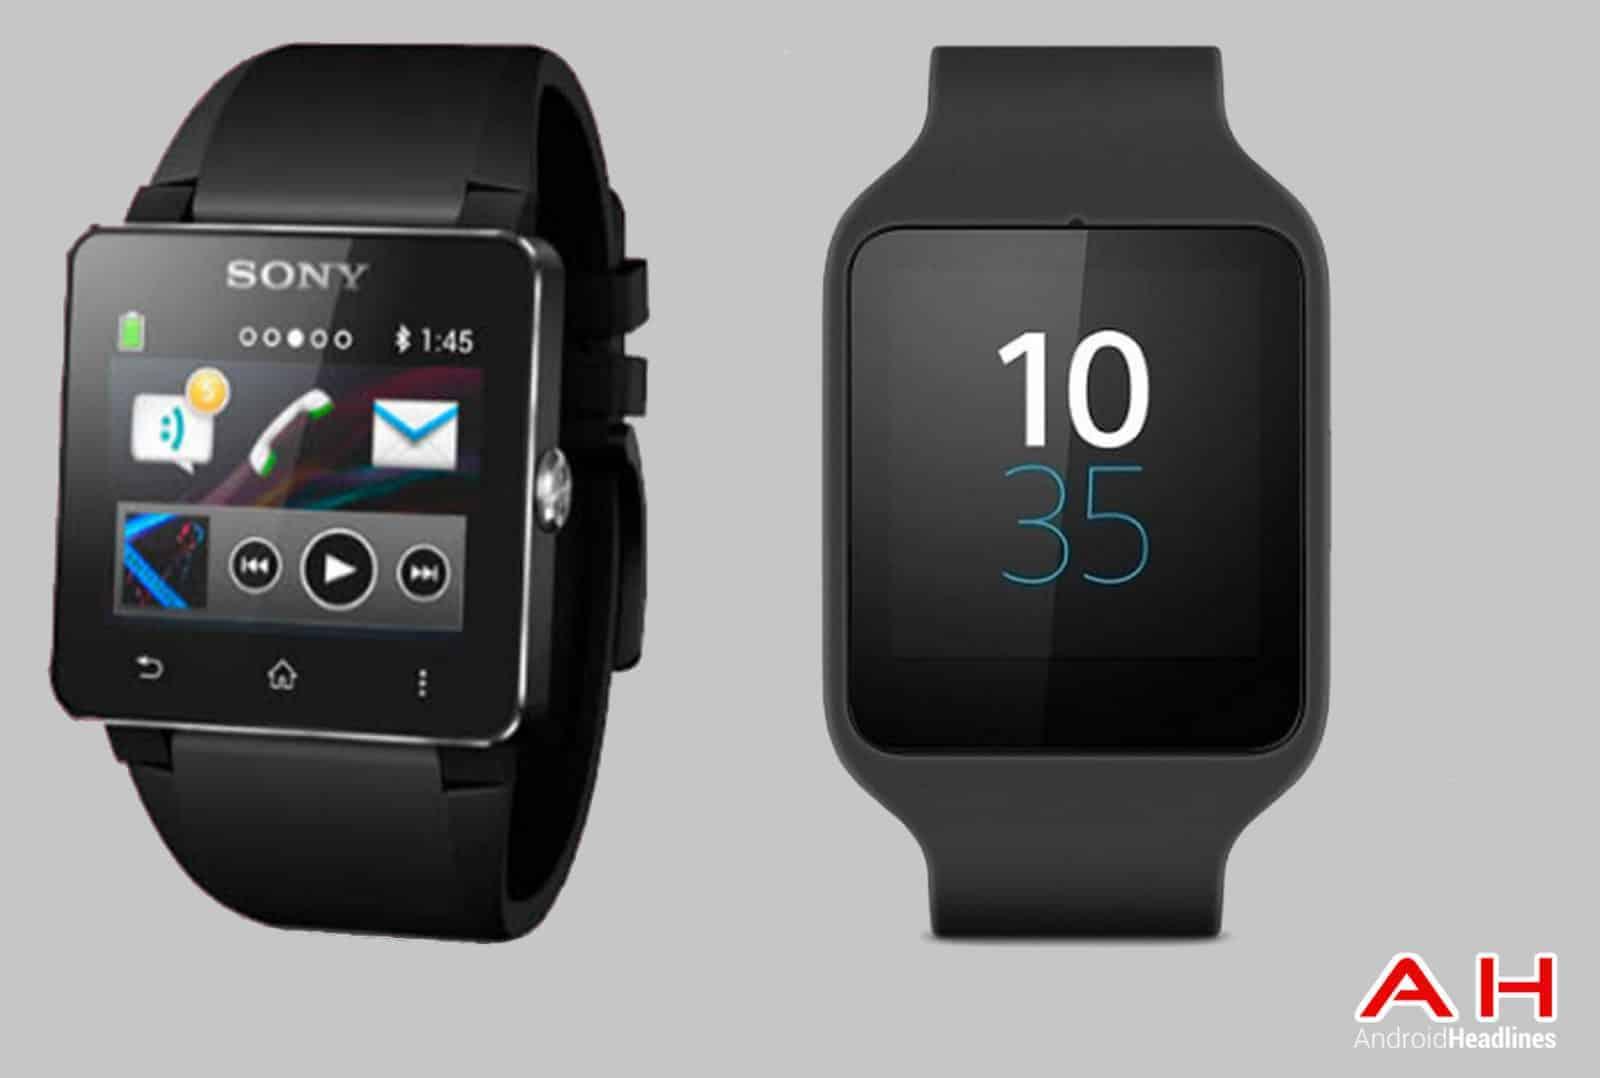 smartwatch comparisons sony smartwatch 2 vs sony. Black Bedroom Furniture Sets. Home Design Ideas